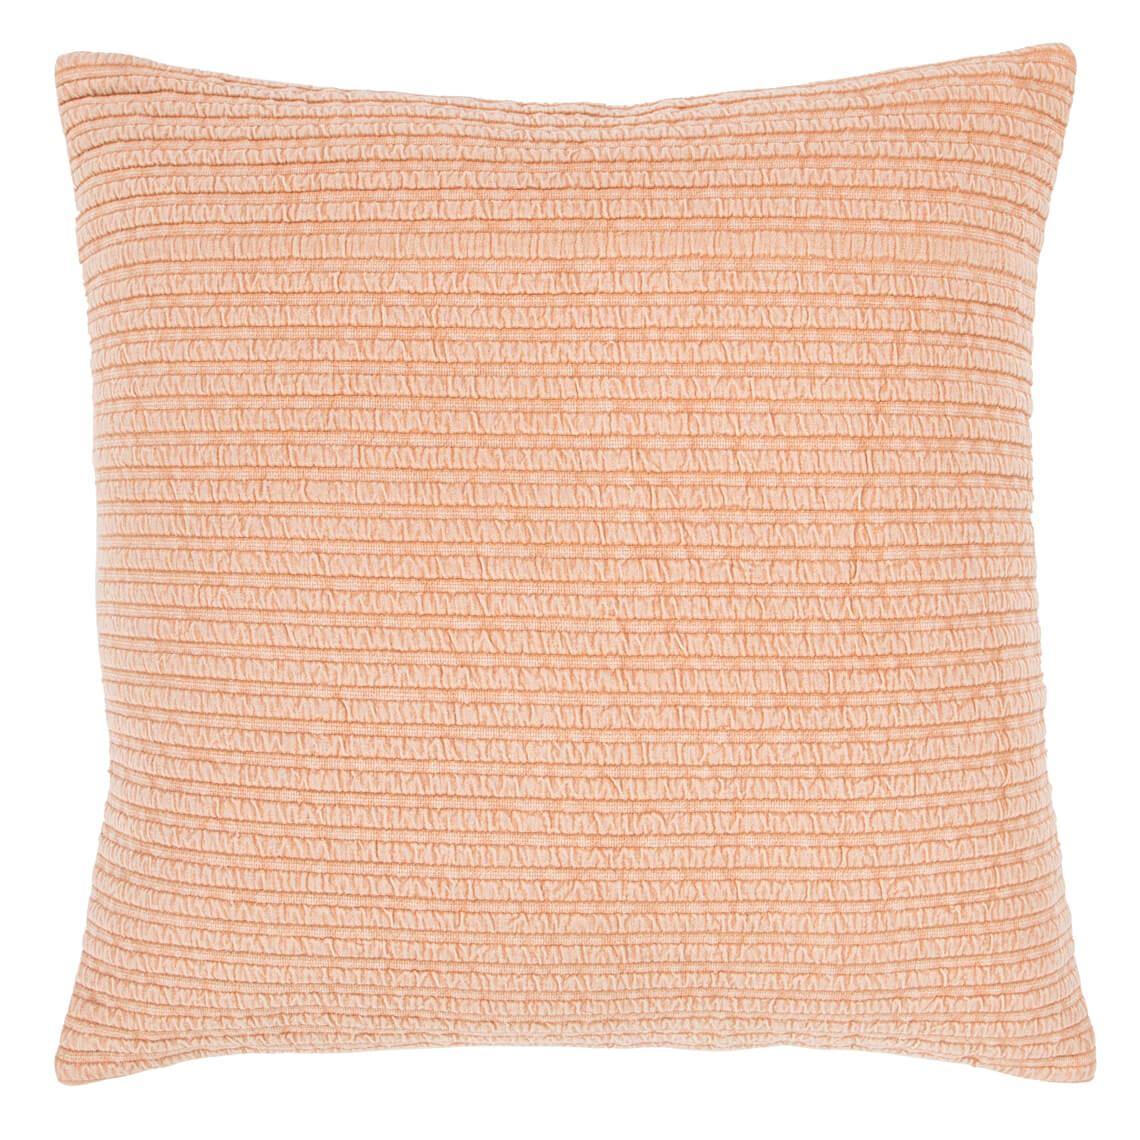 Paige Cushion Size W 50cm x D 50cm x H 14cm in Blush Freedom